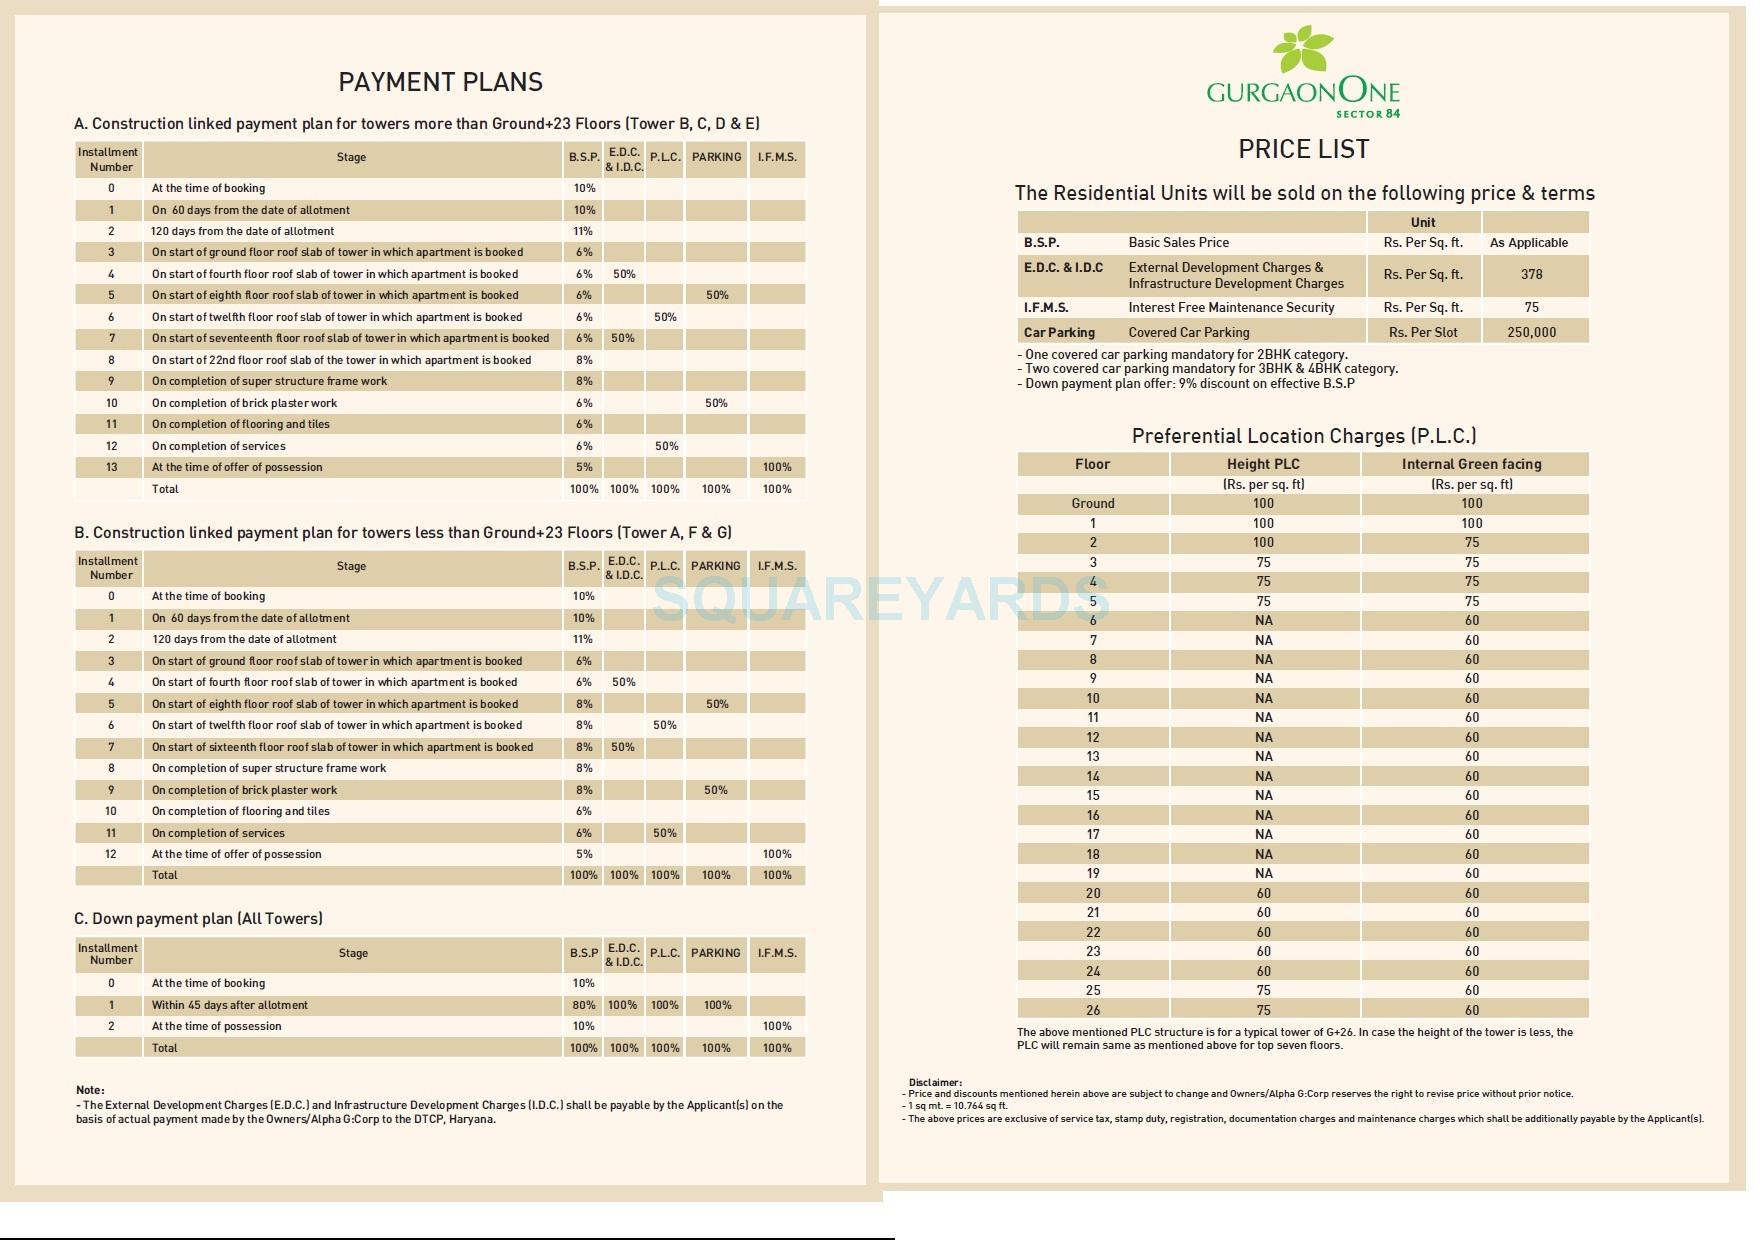 alpha g corp gurgaon one 84 payment plan image1